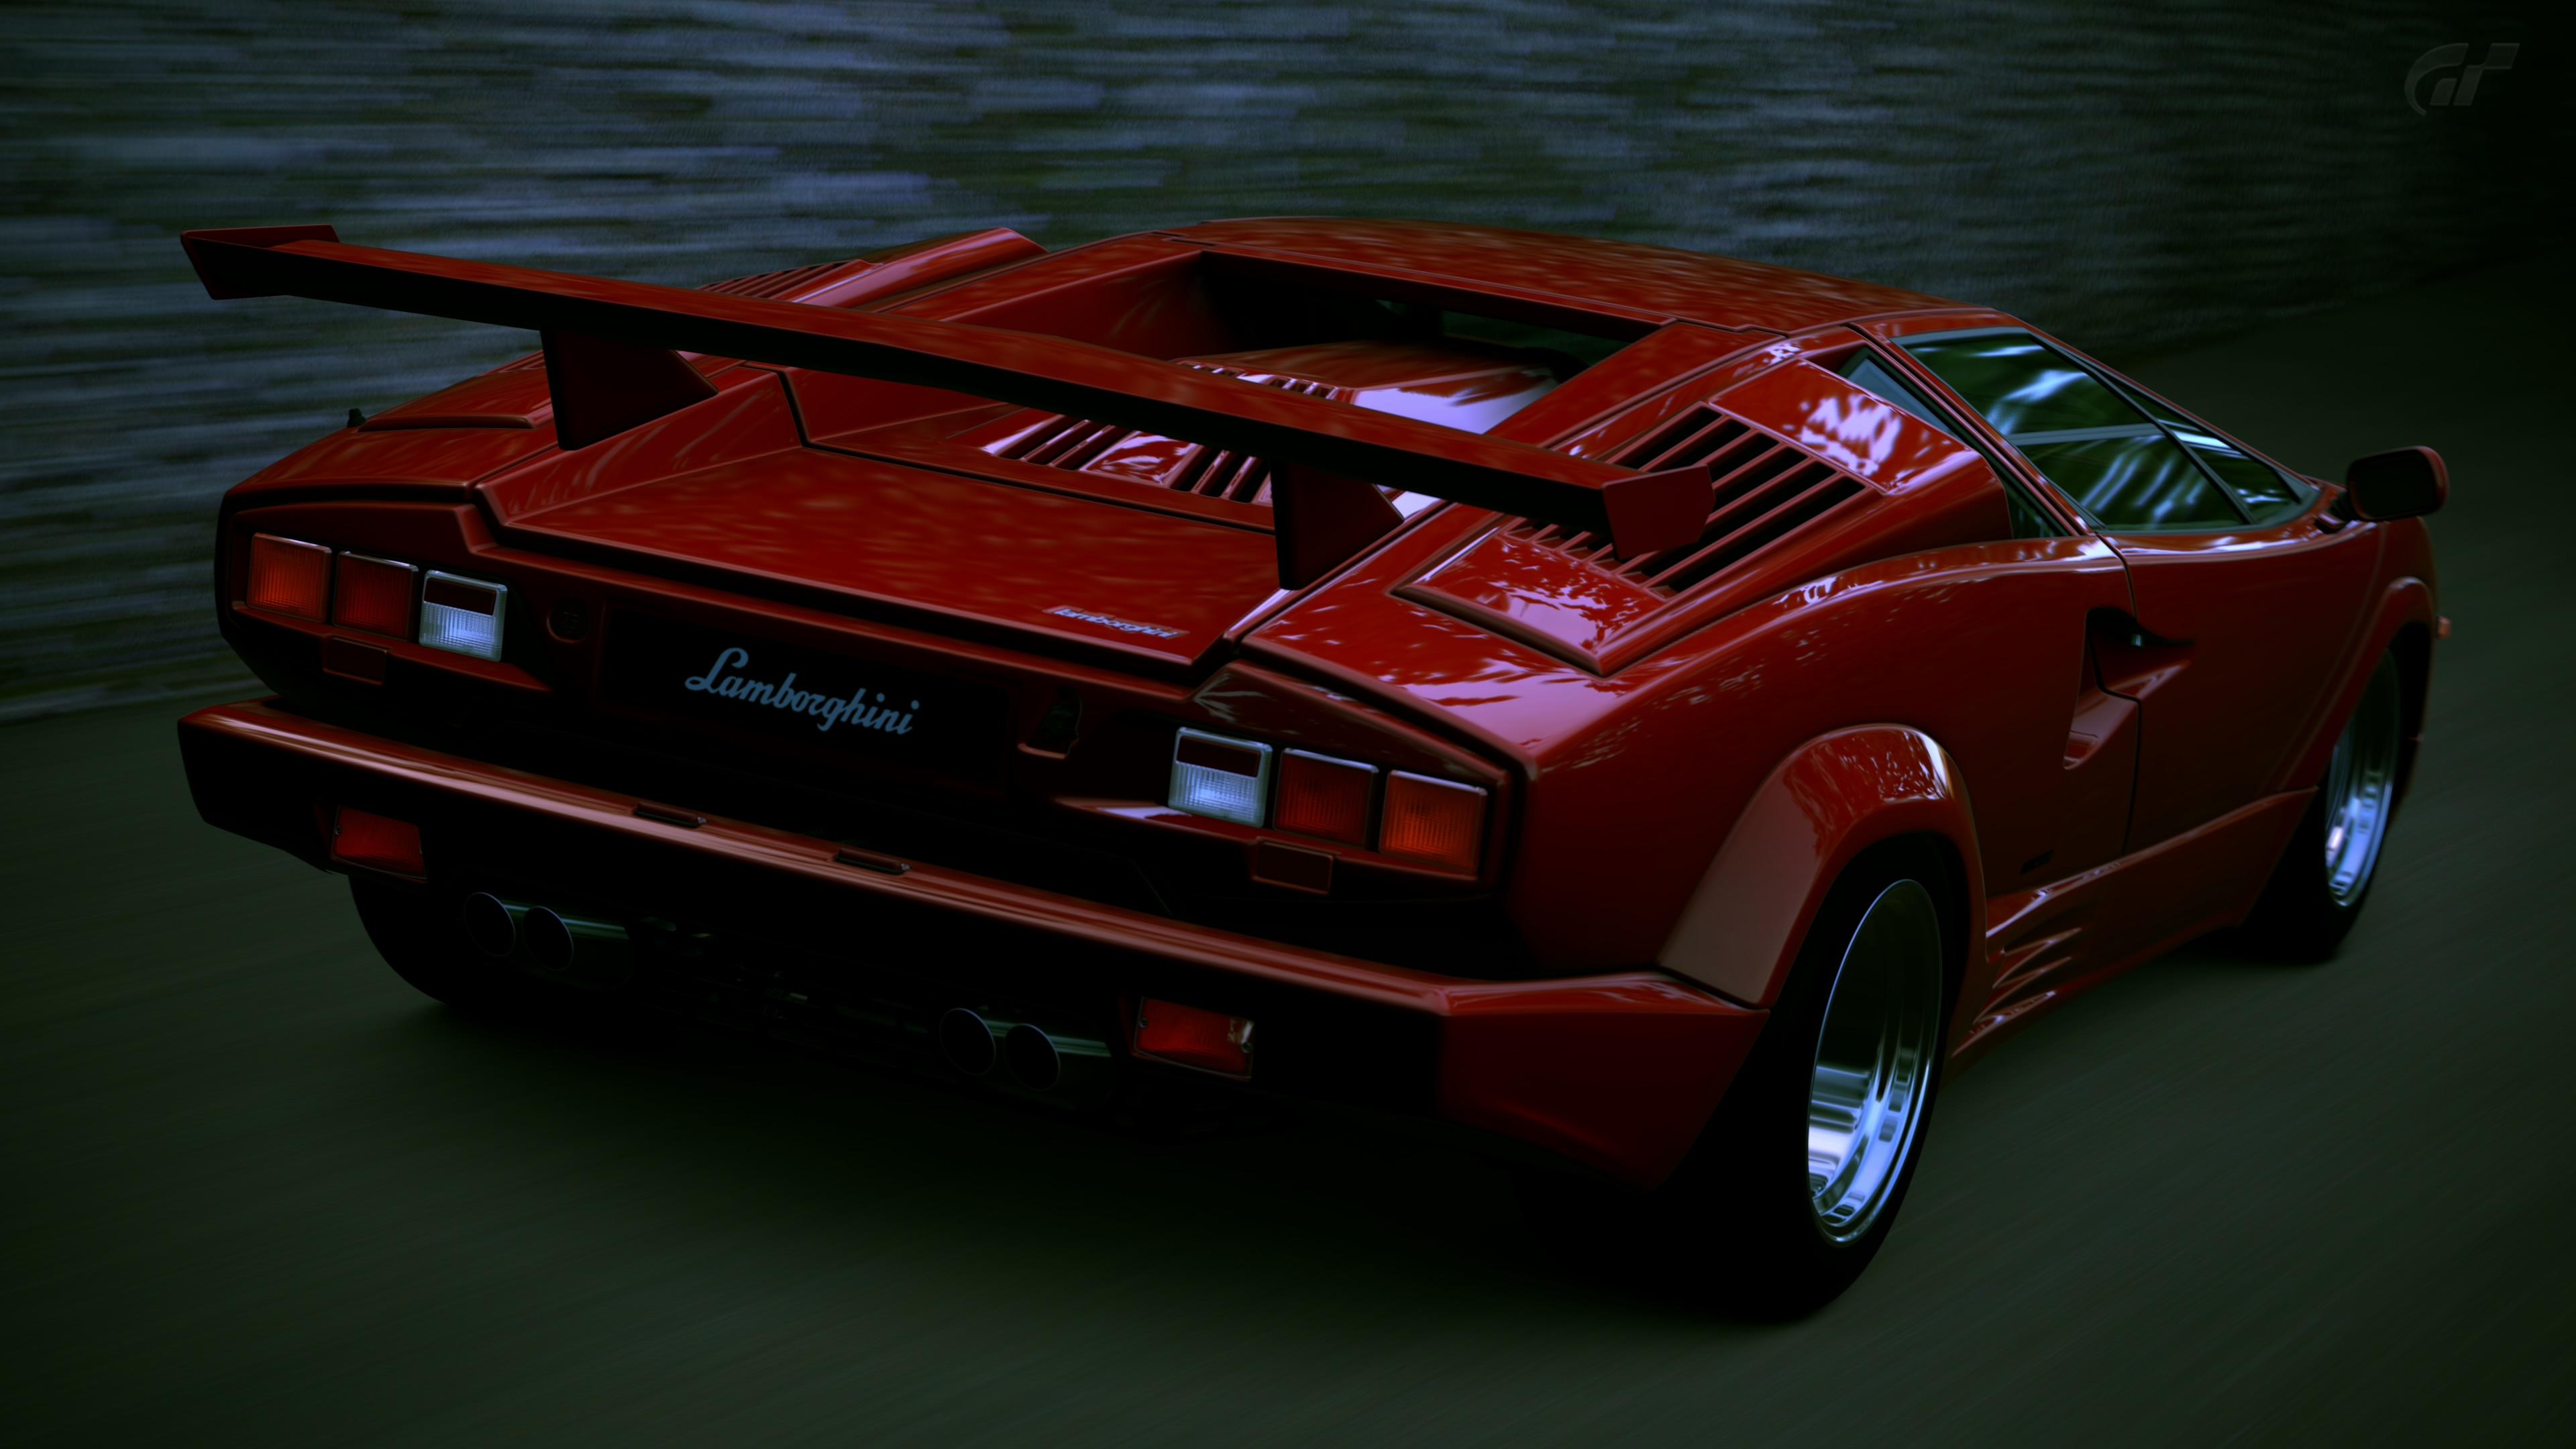 lamborghini_countach_25th_anniversary__gt6__by_vertualissimo-d7ht8d5 Elegant Lamborghini Countach 25th Anniversary Specs Cars Trend